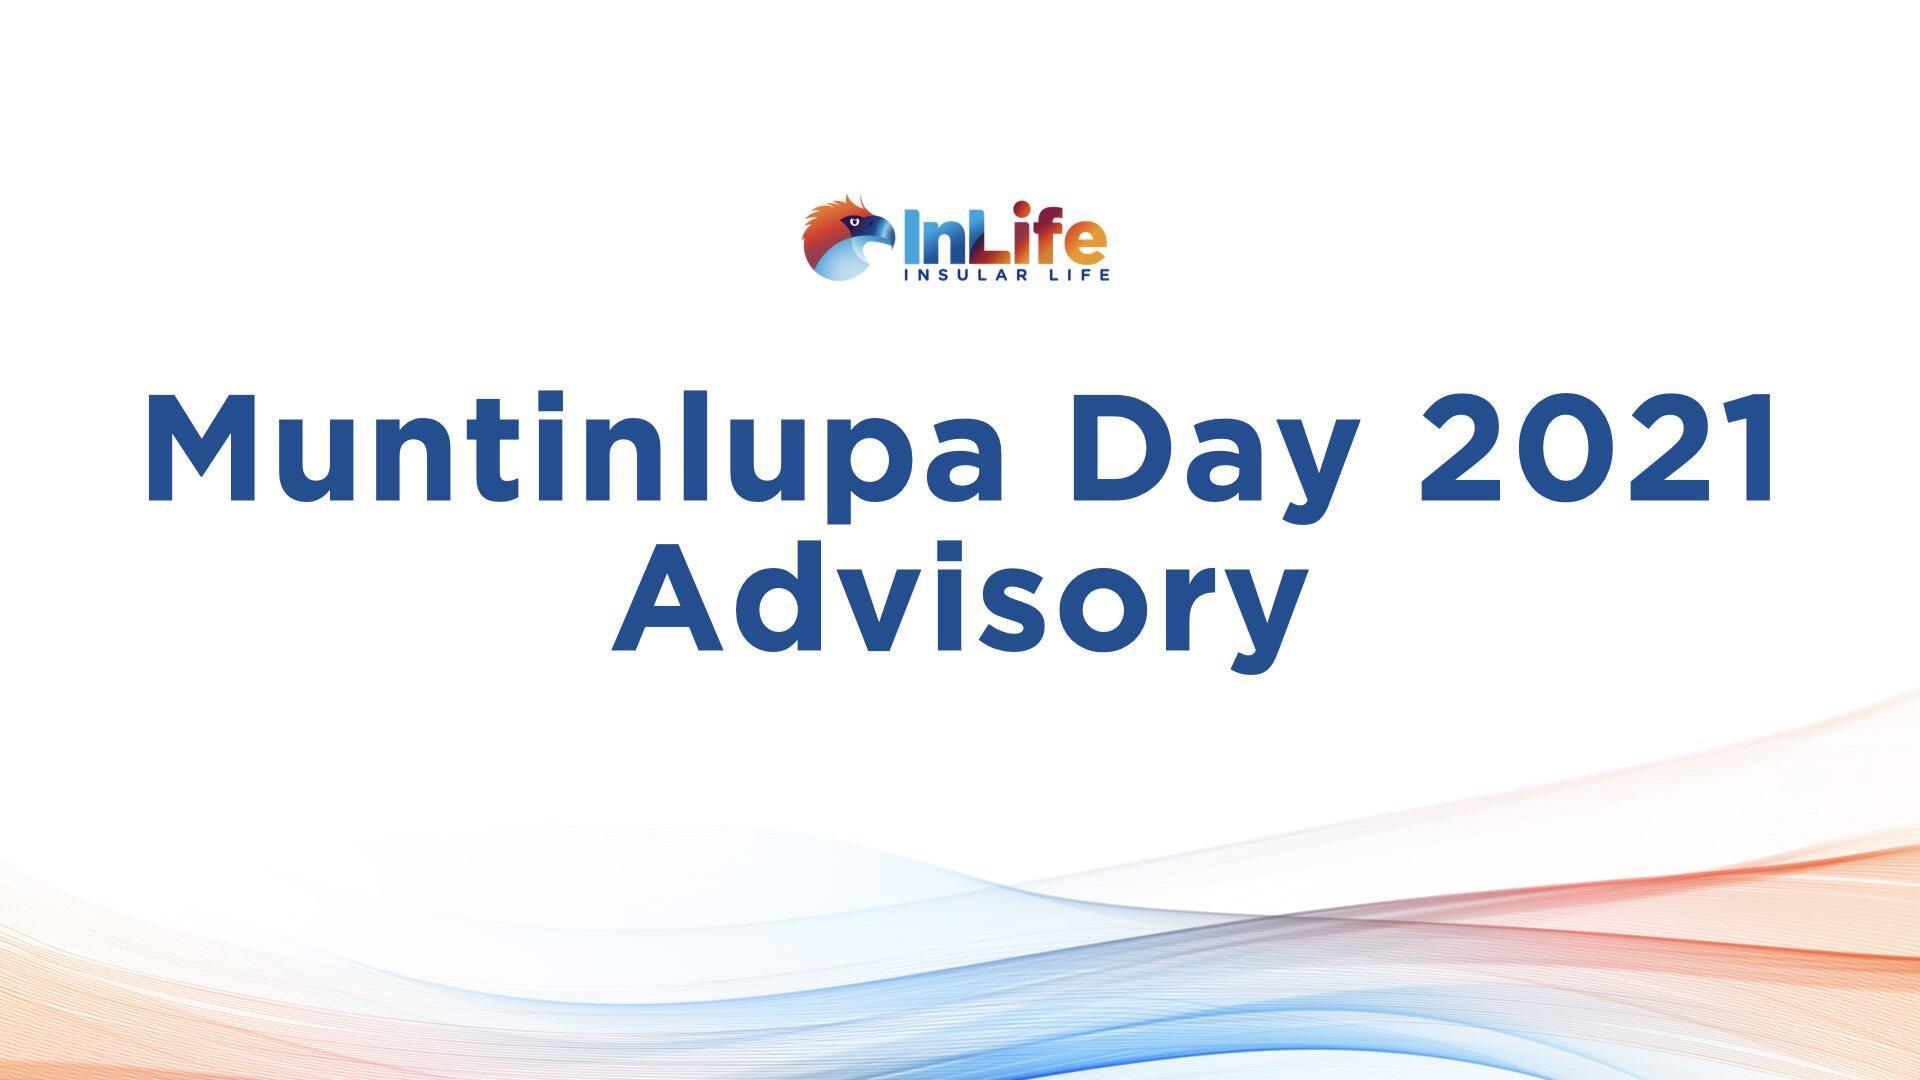 InLife Advisory on Muntinlupa Day 2021